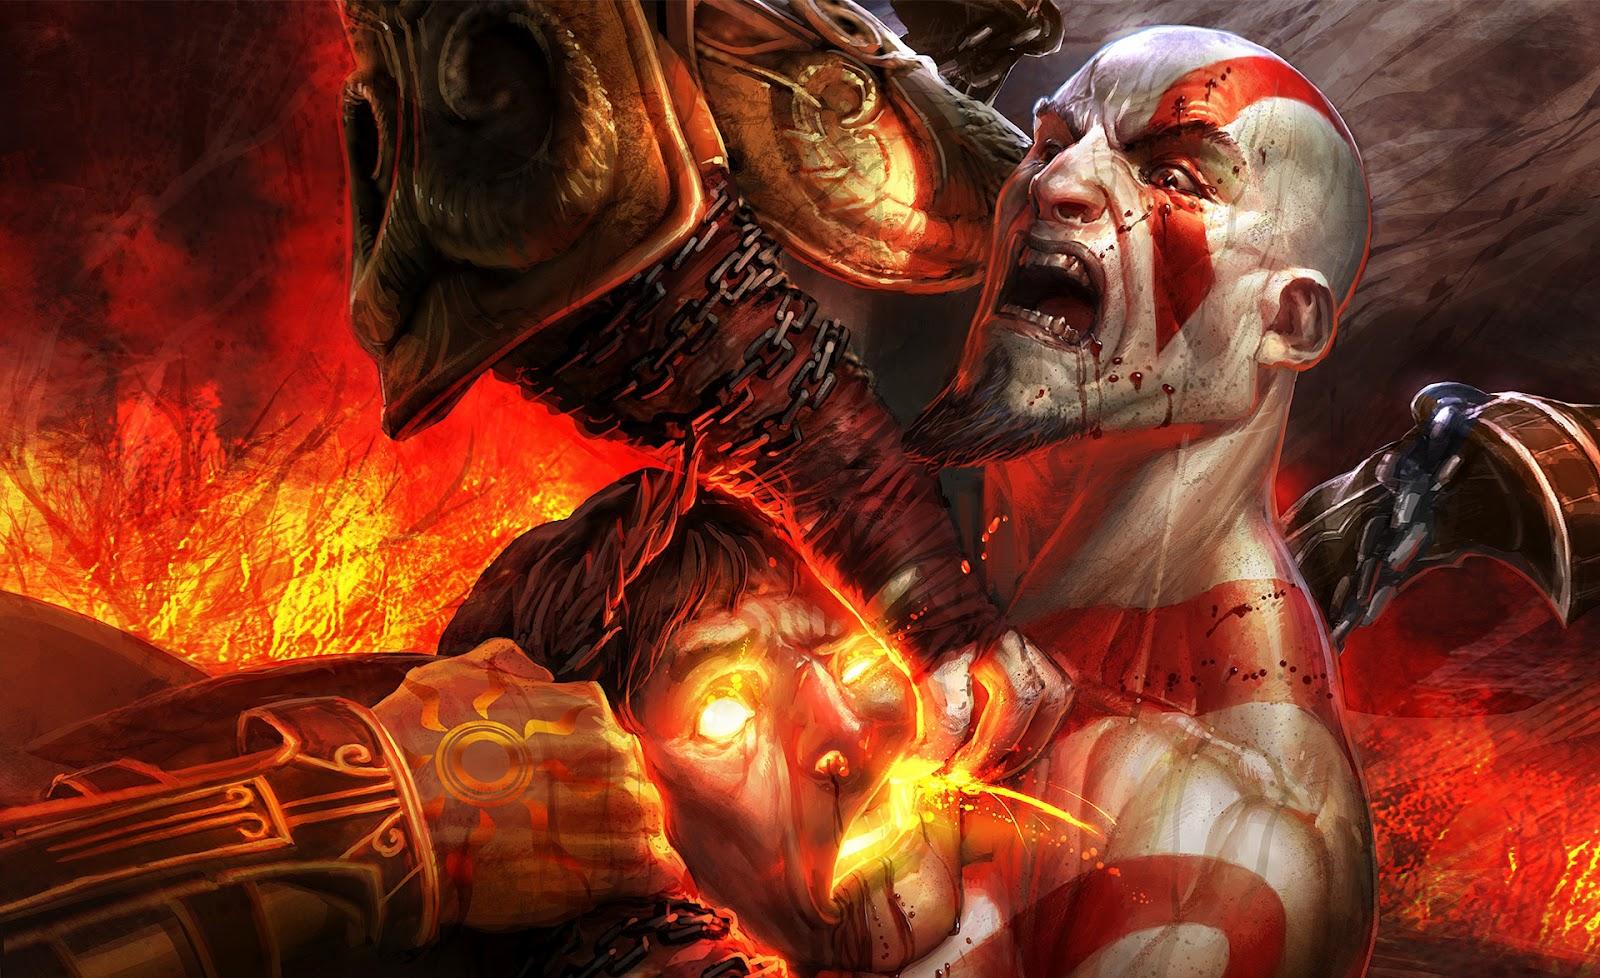 Background image vs img - God Of War Kratos Vs Helios Wallpaper Background Sony Action Img Image